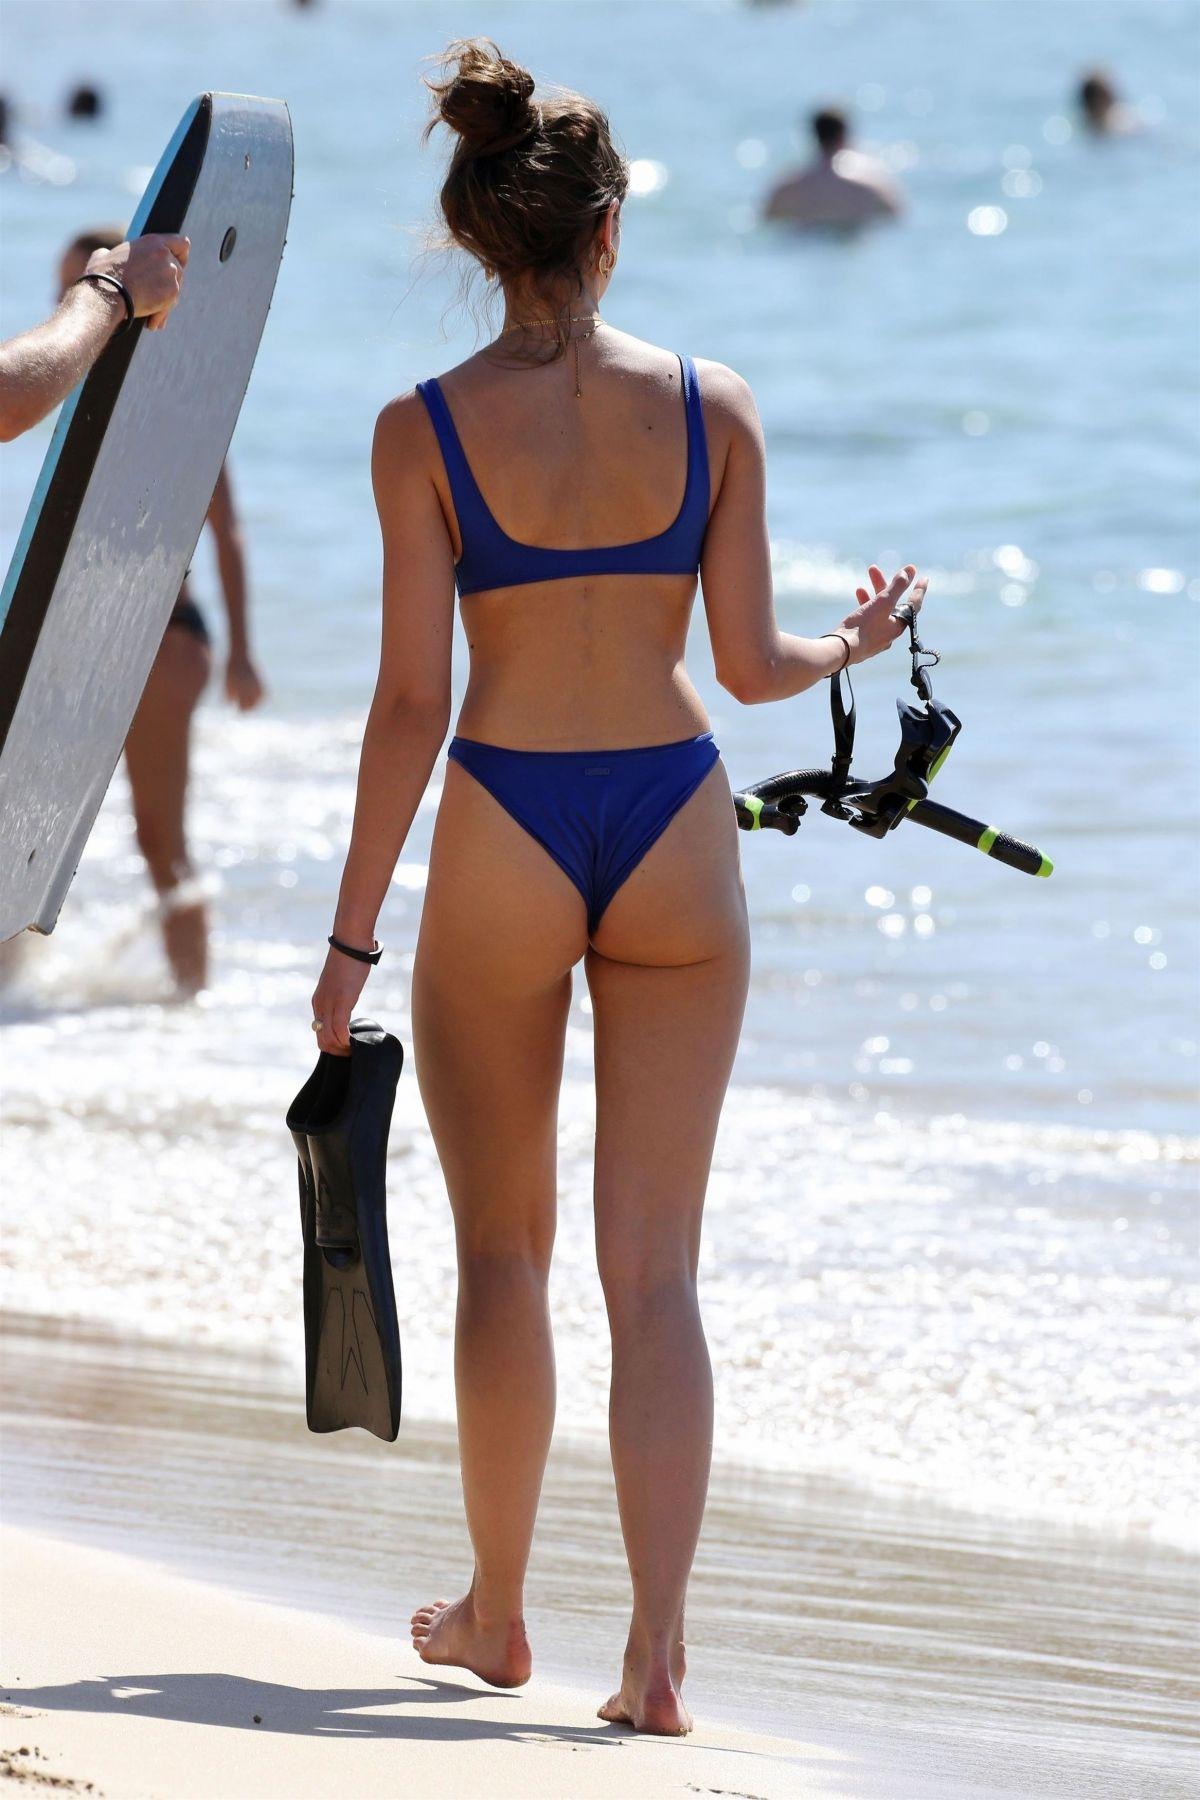 Tits Bikini Taylor Hill naked photo 2017